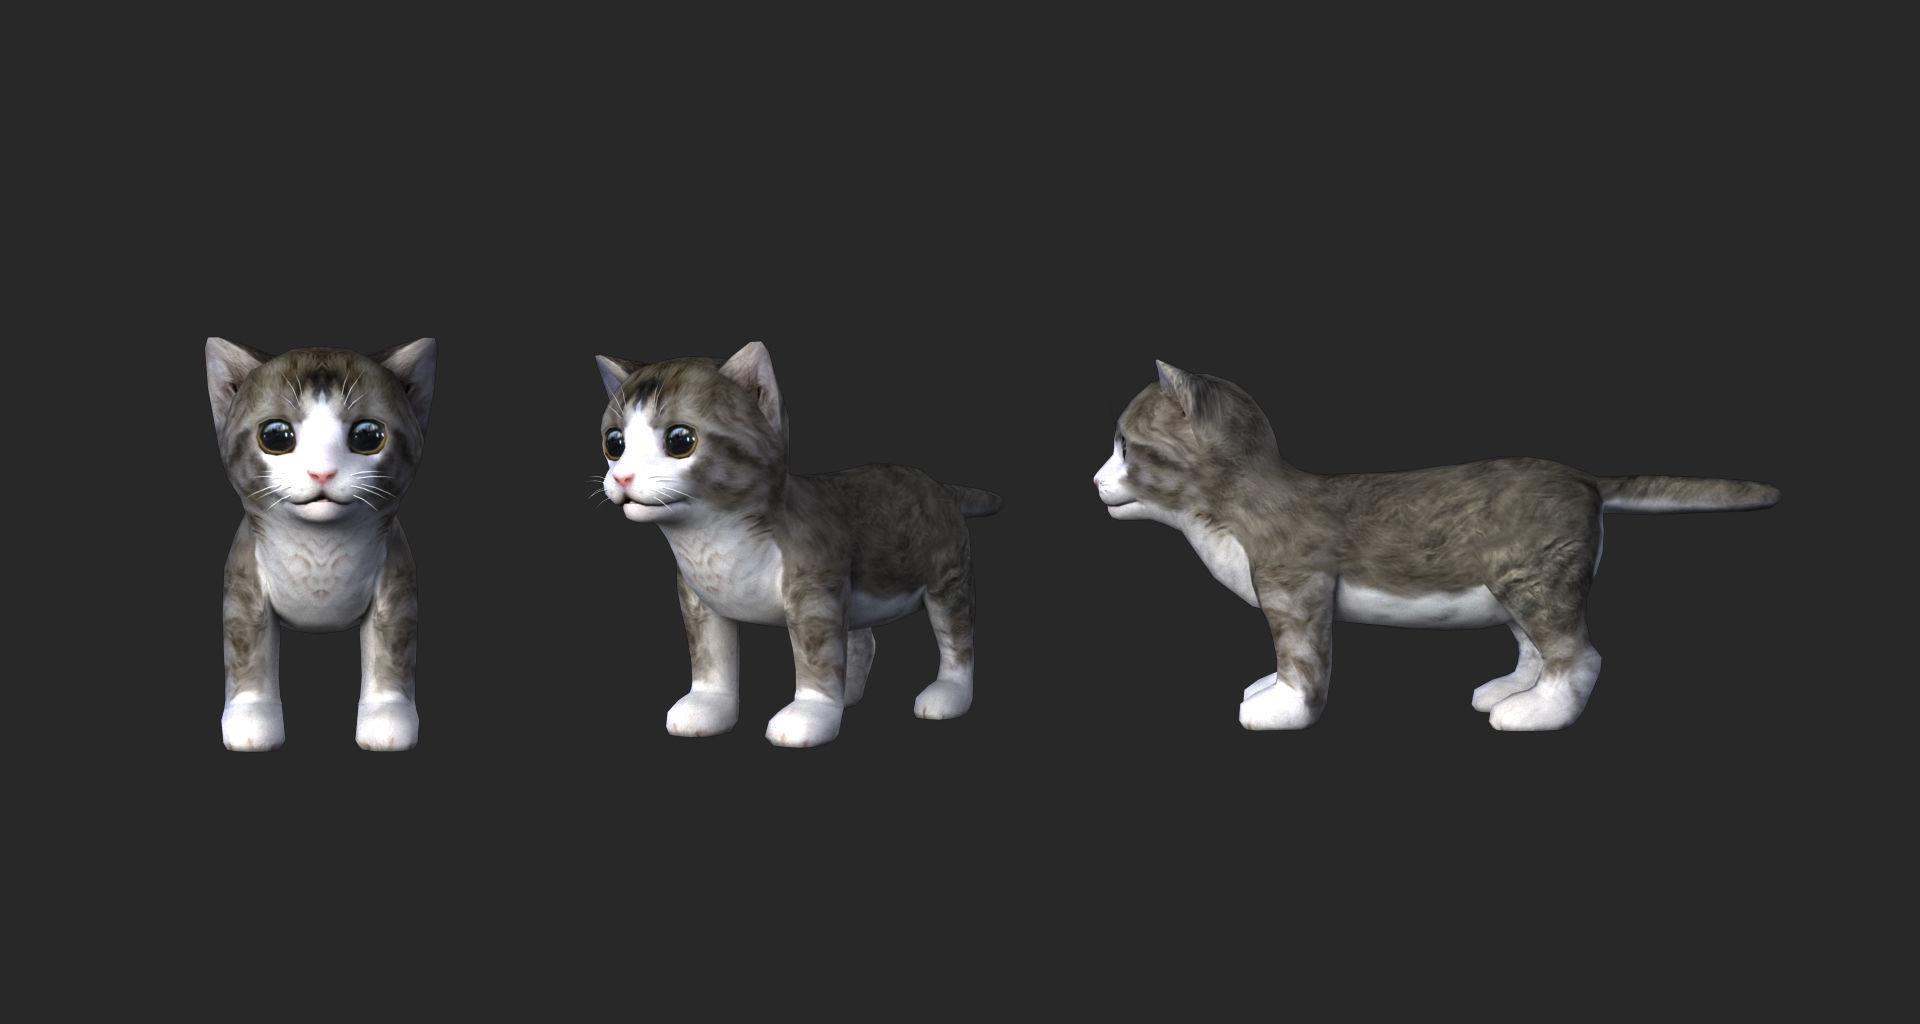 Cute cat 3D model material file